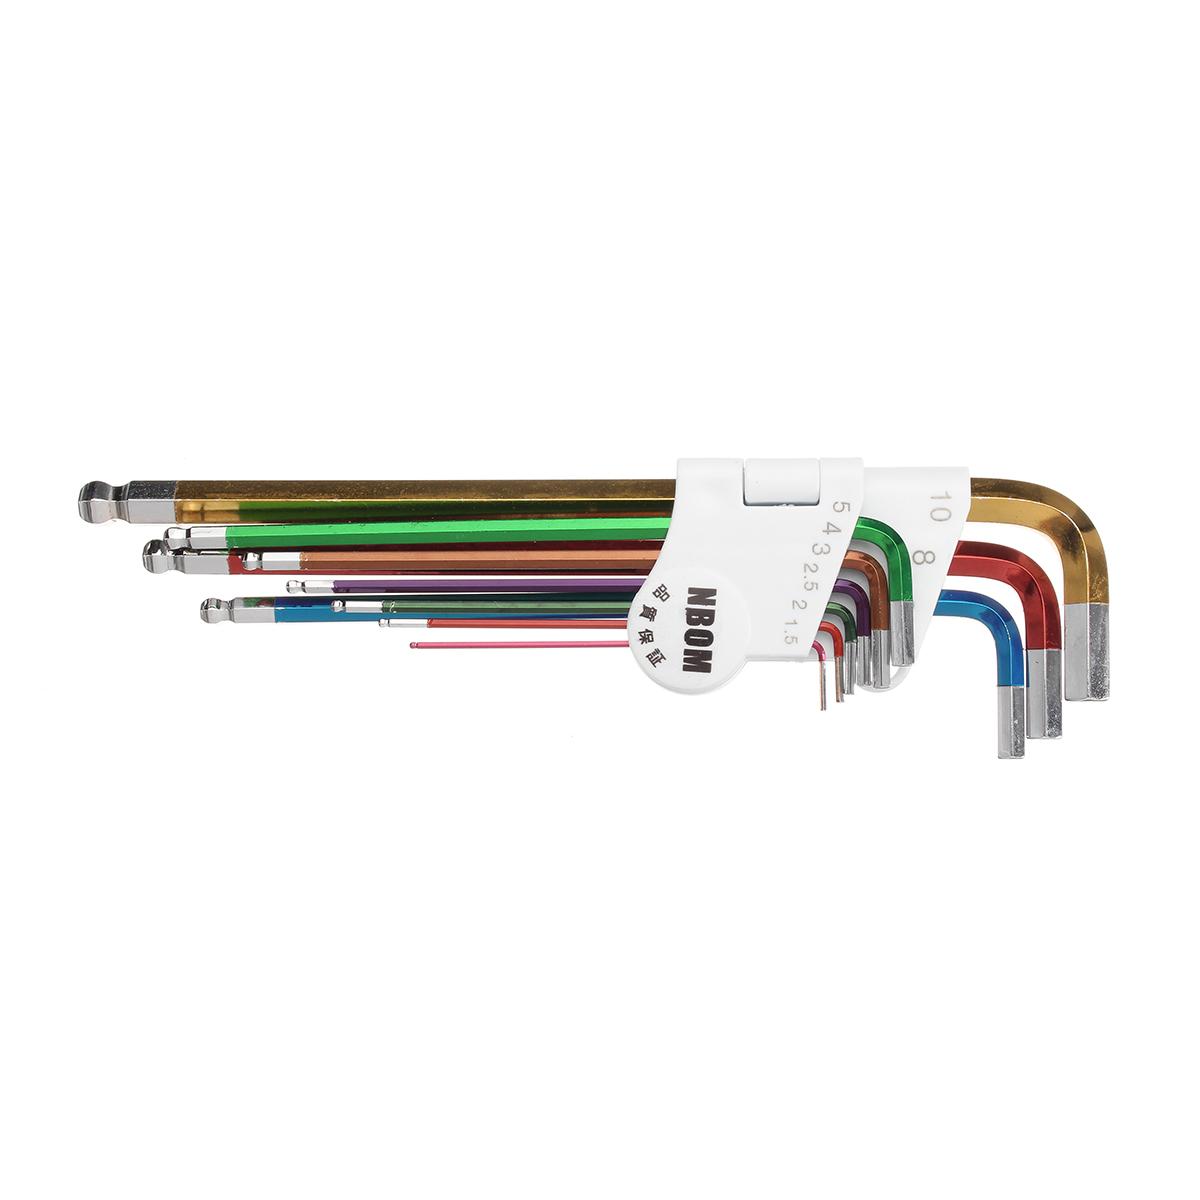 9 Pcs L Shape Hex Key Set Allen Wrench 1.5mm 2mm  2.5mm 3mm 4mm 5mm 6mm 8mm 10mm